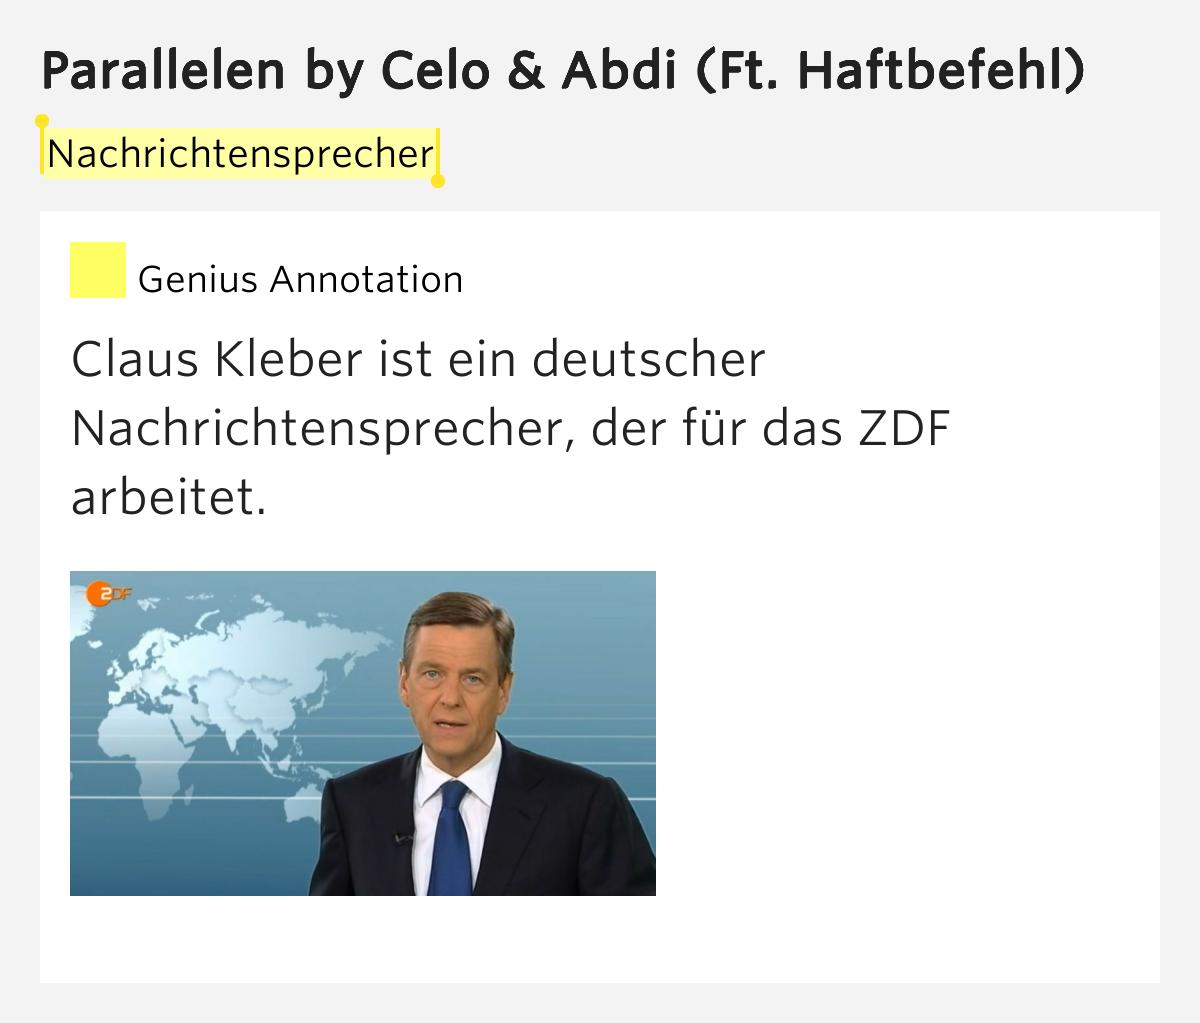 Nachrichtensprecher parallelen lyrics meaning for Nachrichtensprecher zdf